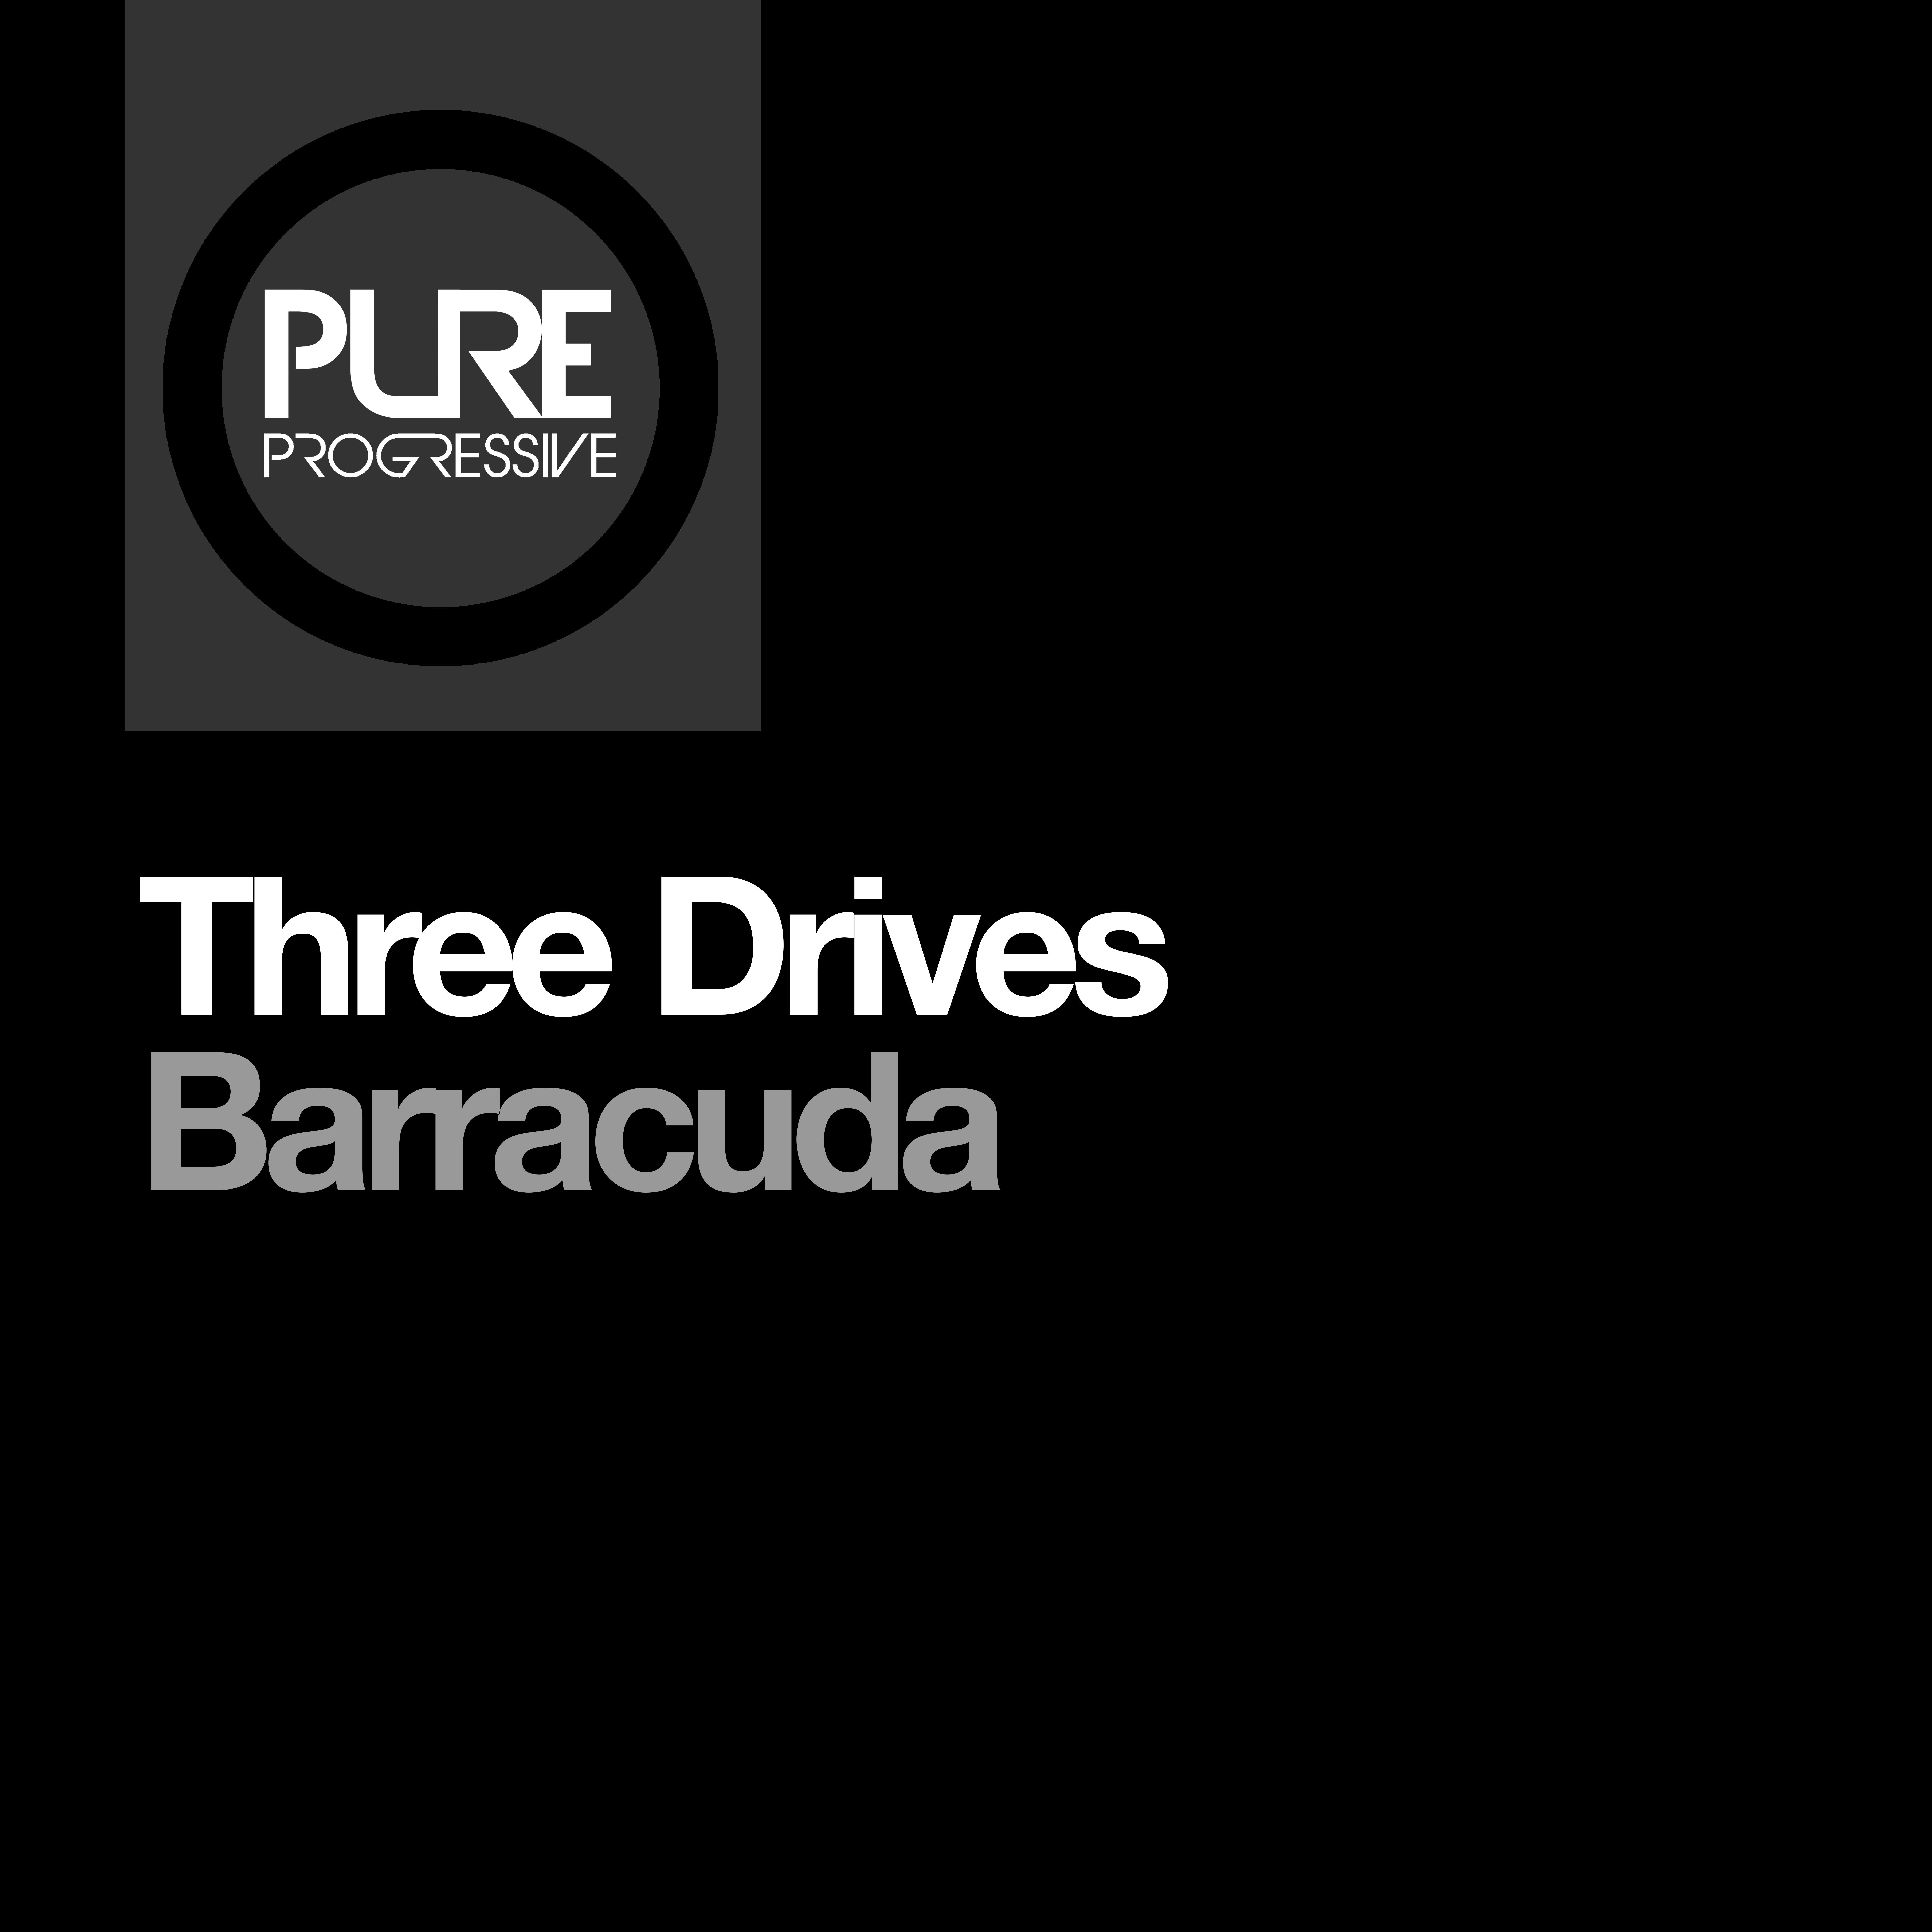 ptp035_three_drives_-_barracuda-1.jpg